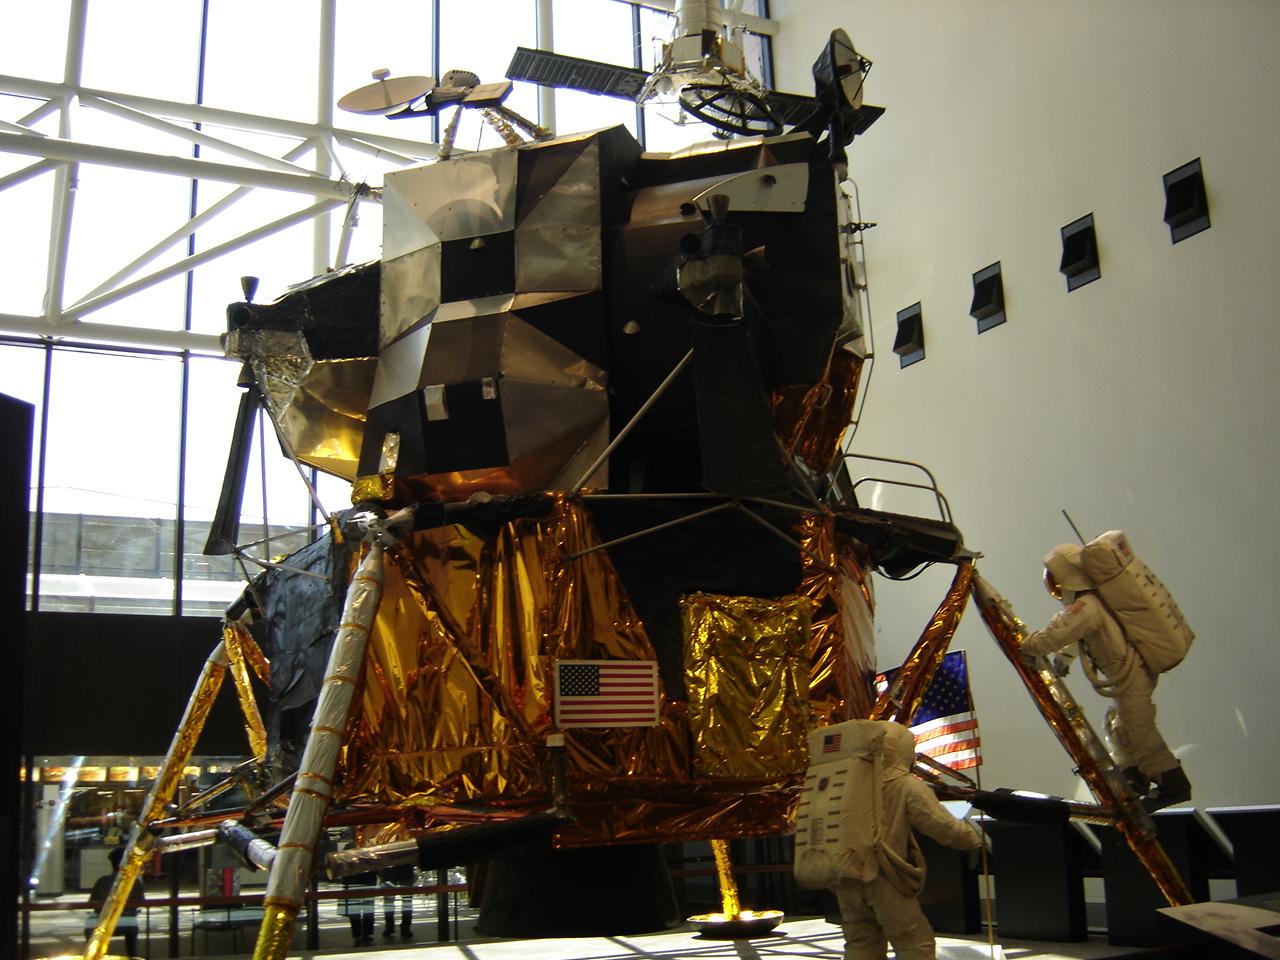 parachute module moon landing - photo #23